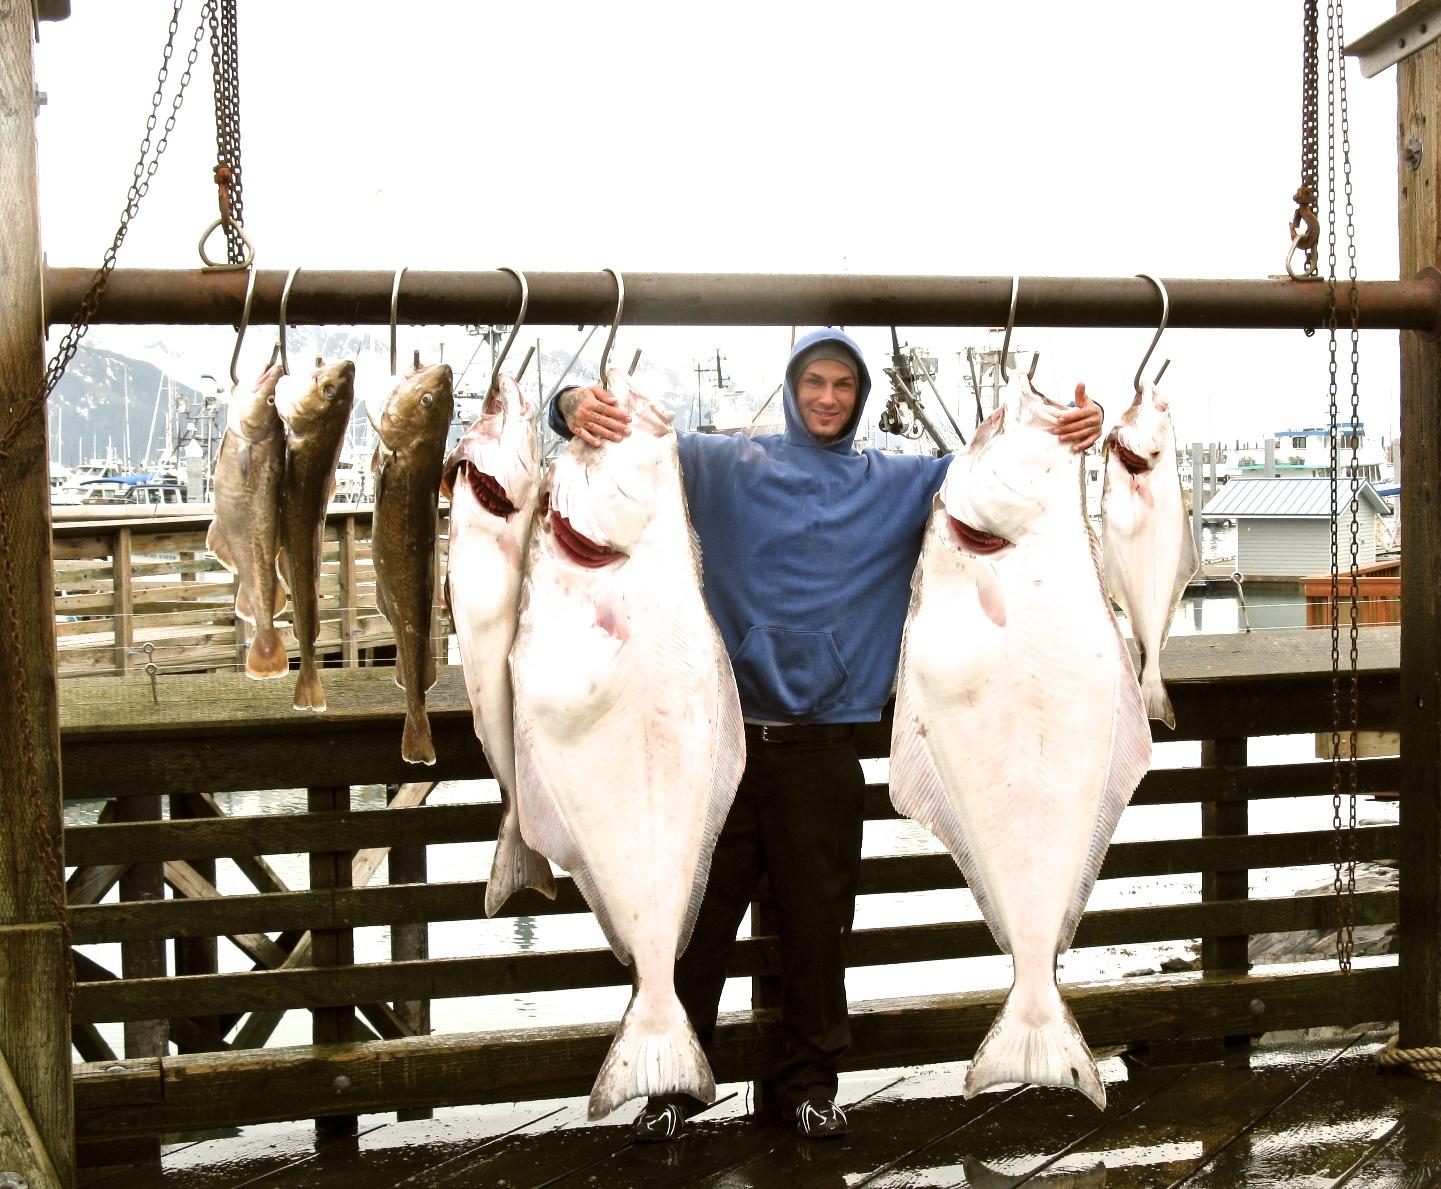 Jerald with Alaskan Halibut he caught in Seward.